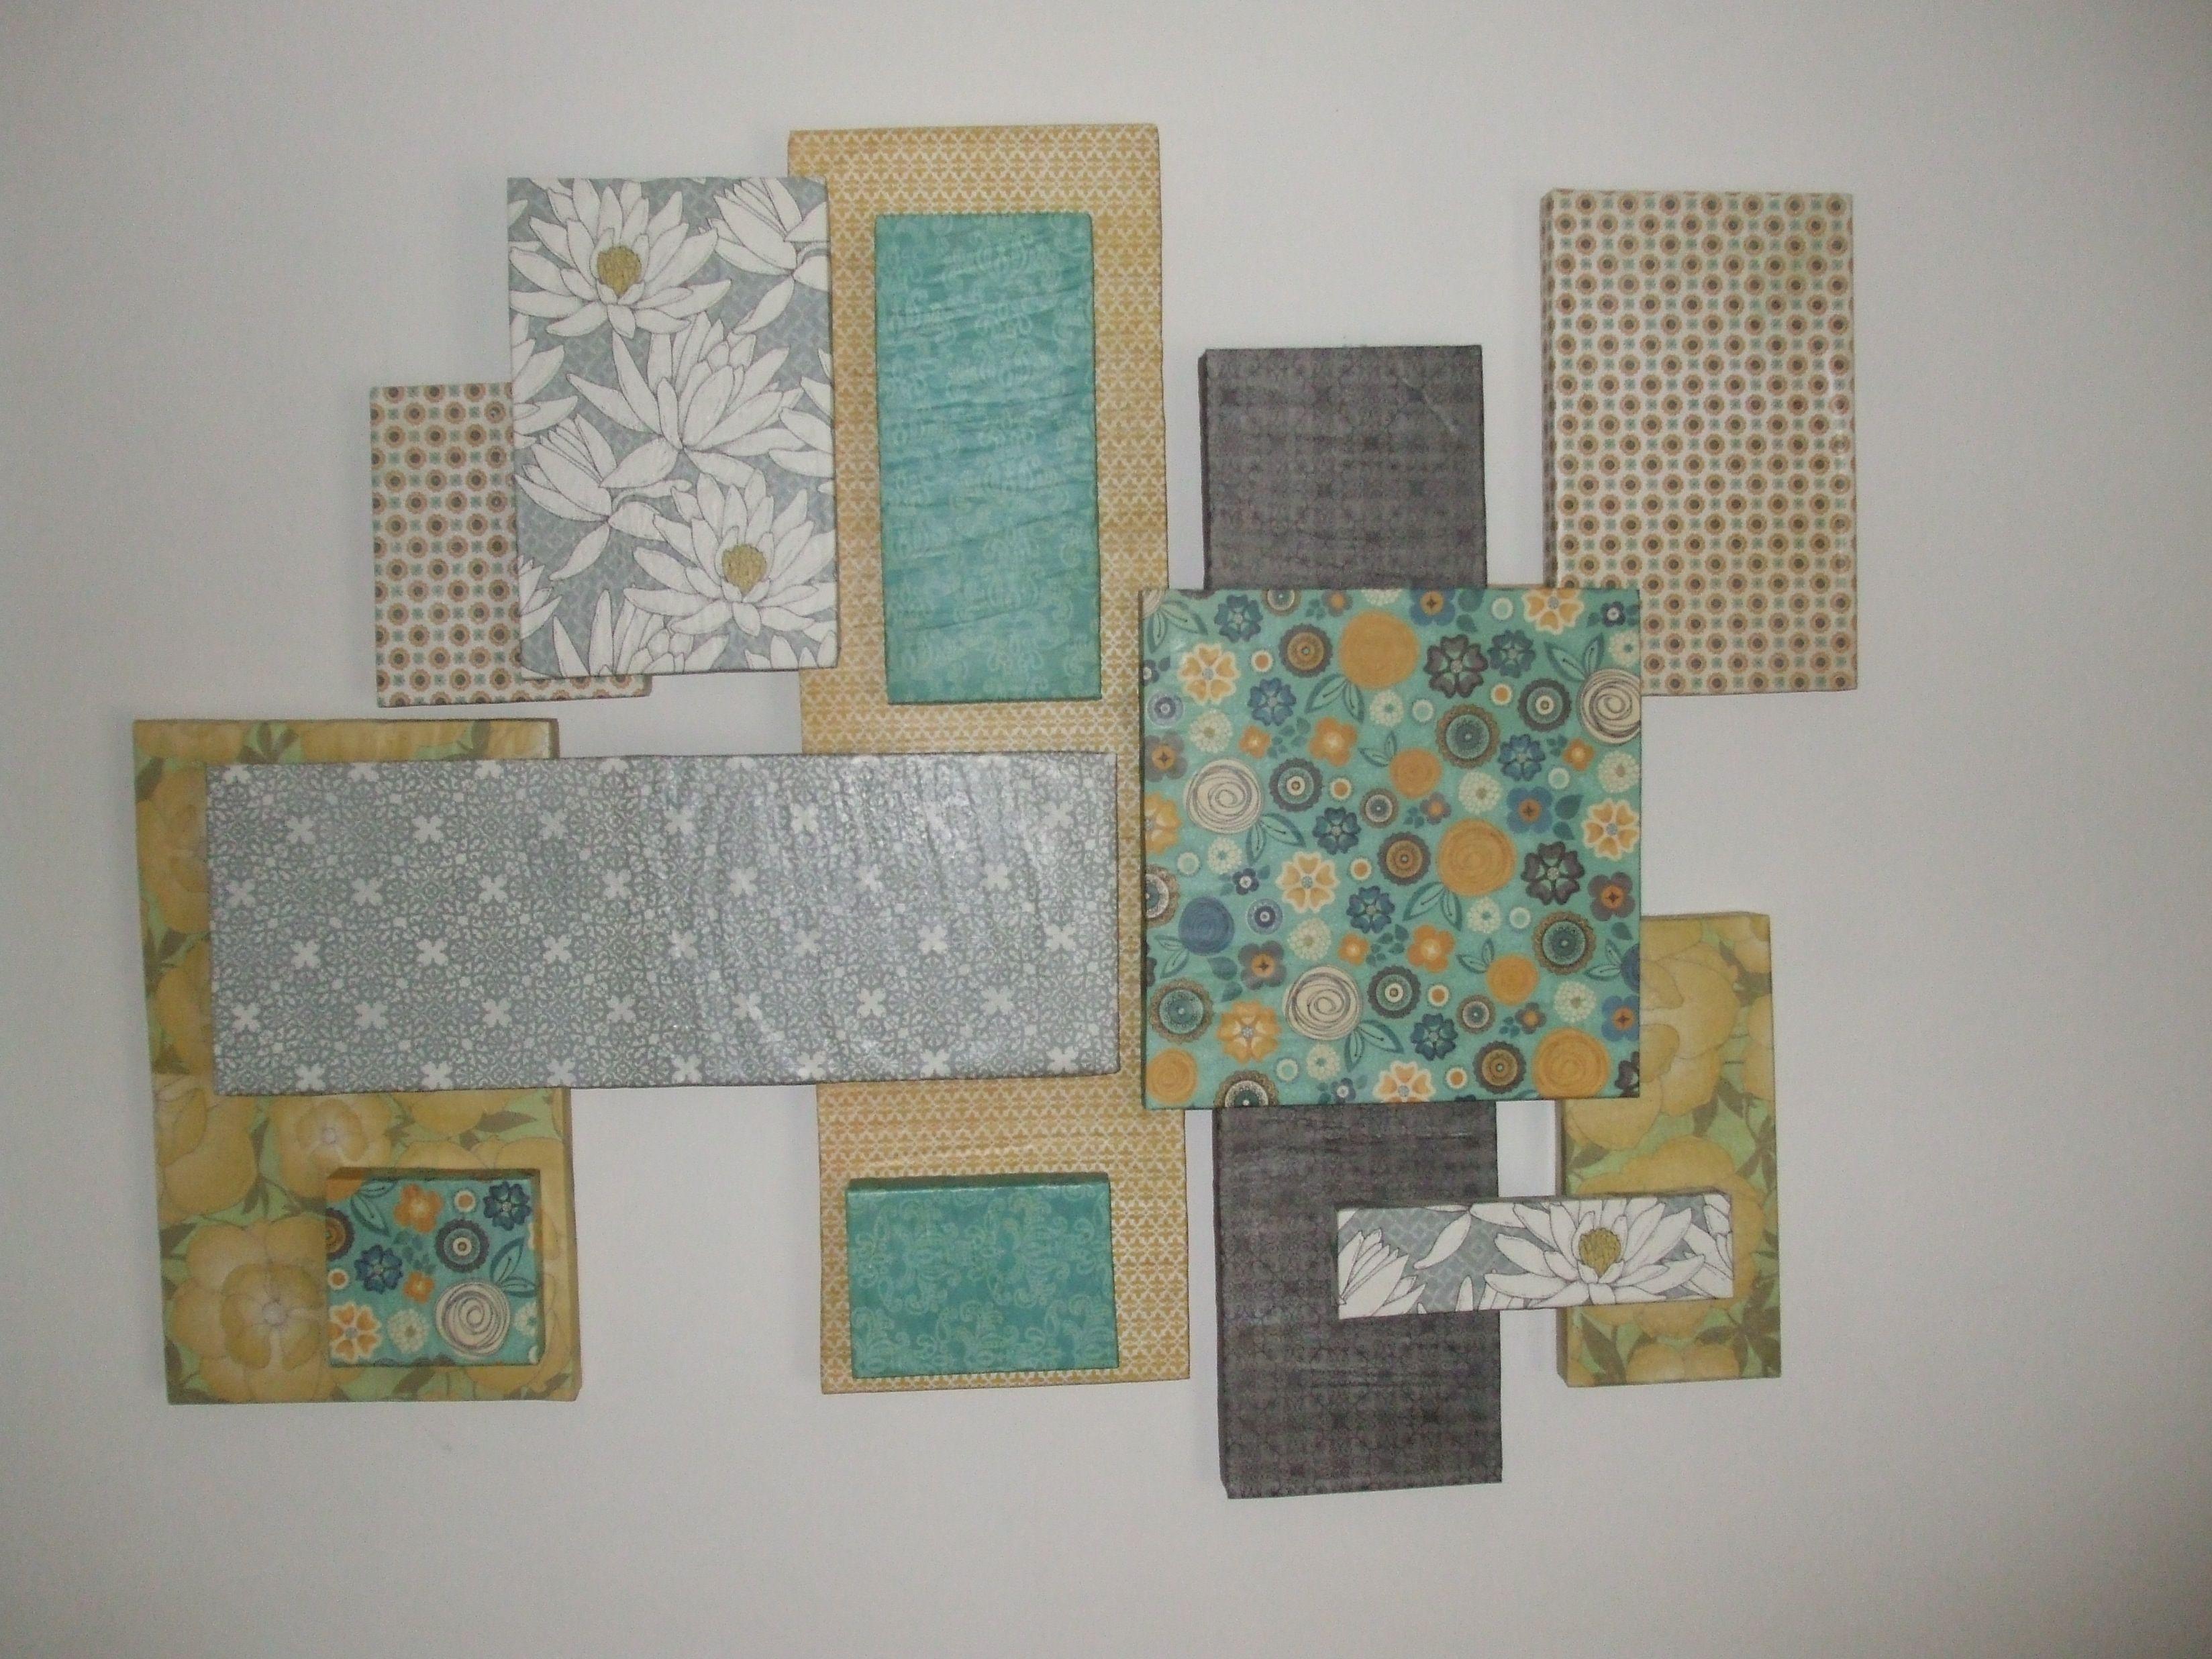 Wall Decor With Scrapbook Paper : Styrofoam and scrapbook paper wall art dorm life